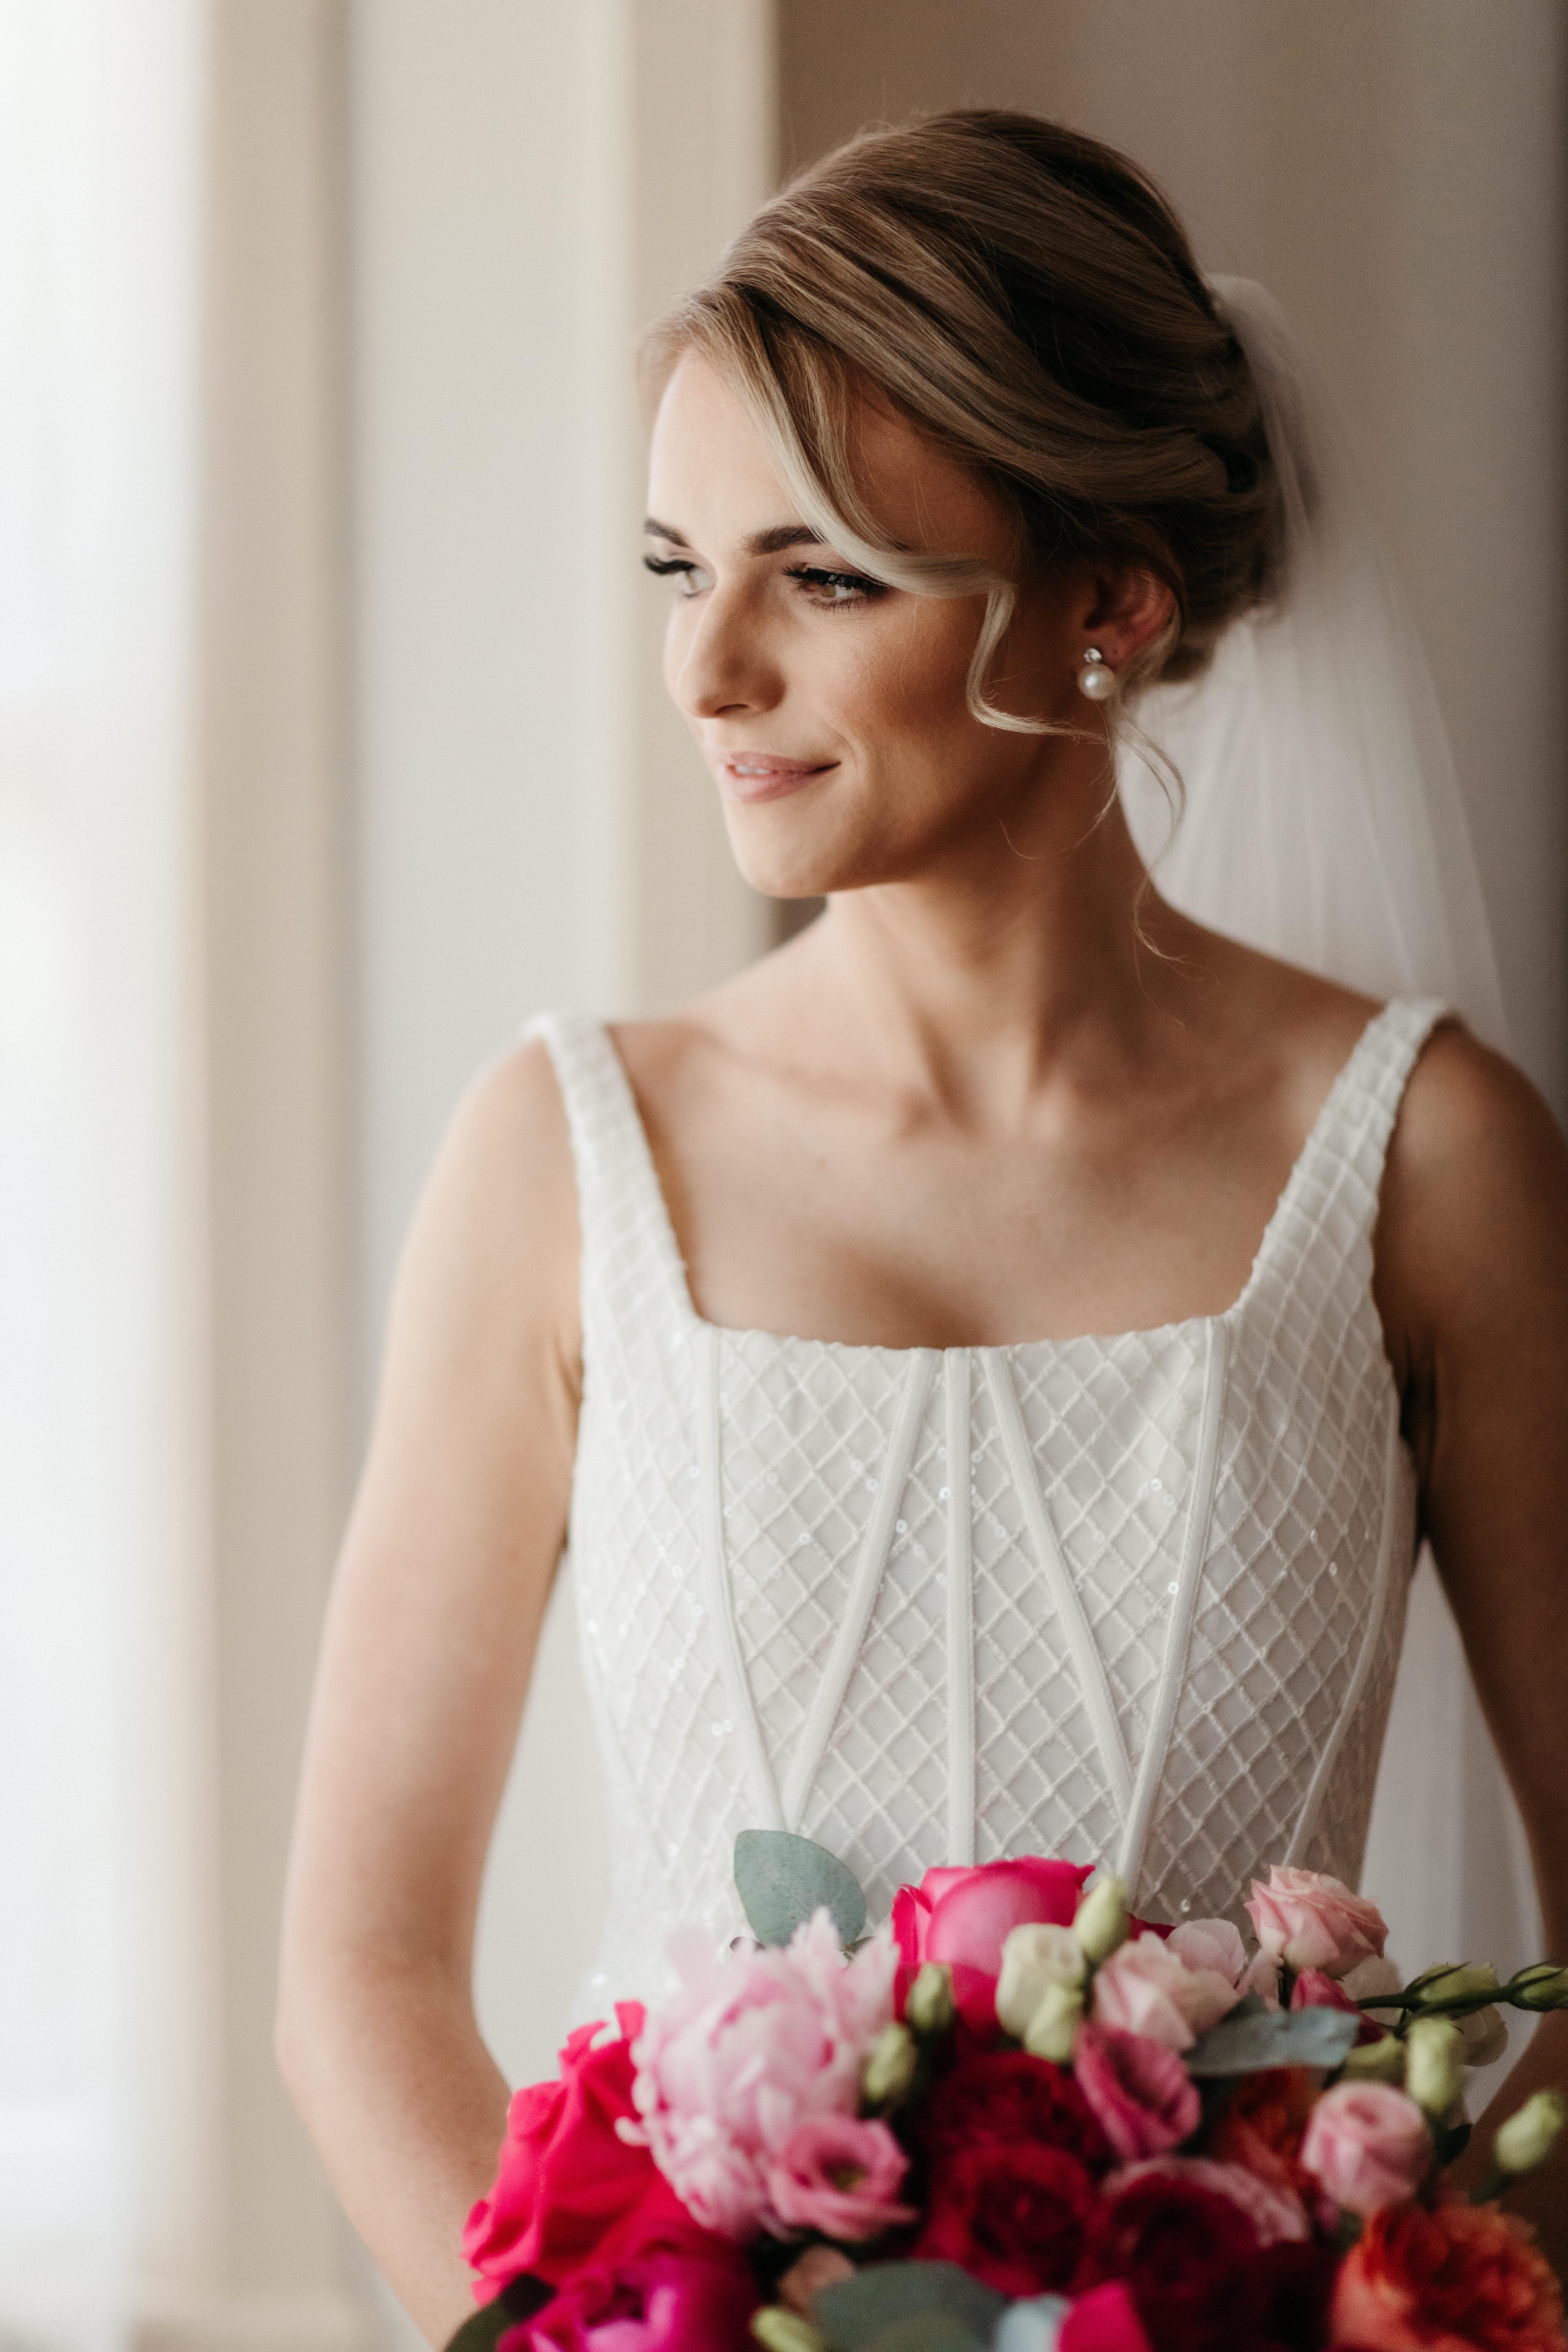 Bride holding bouquet posing